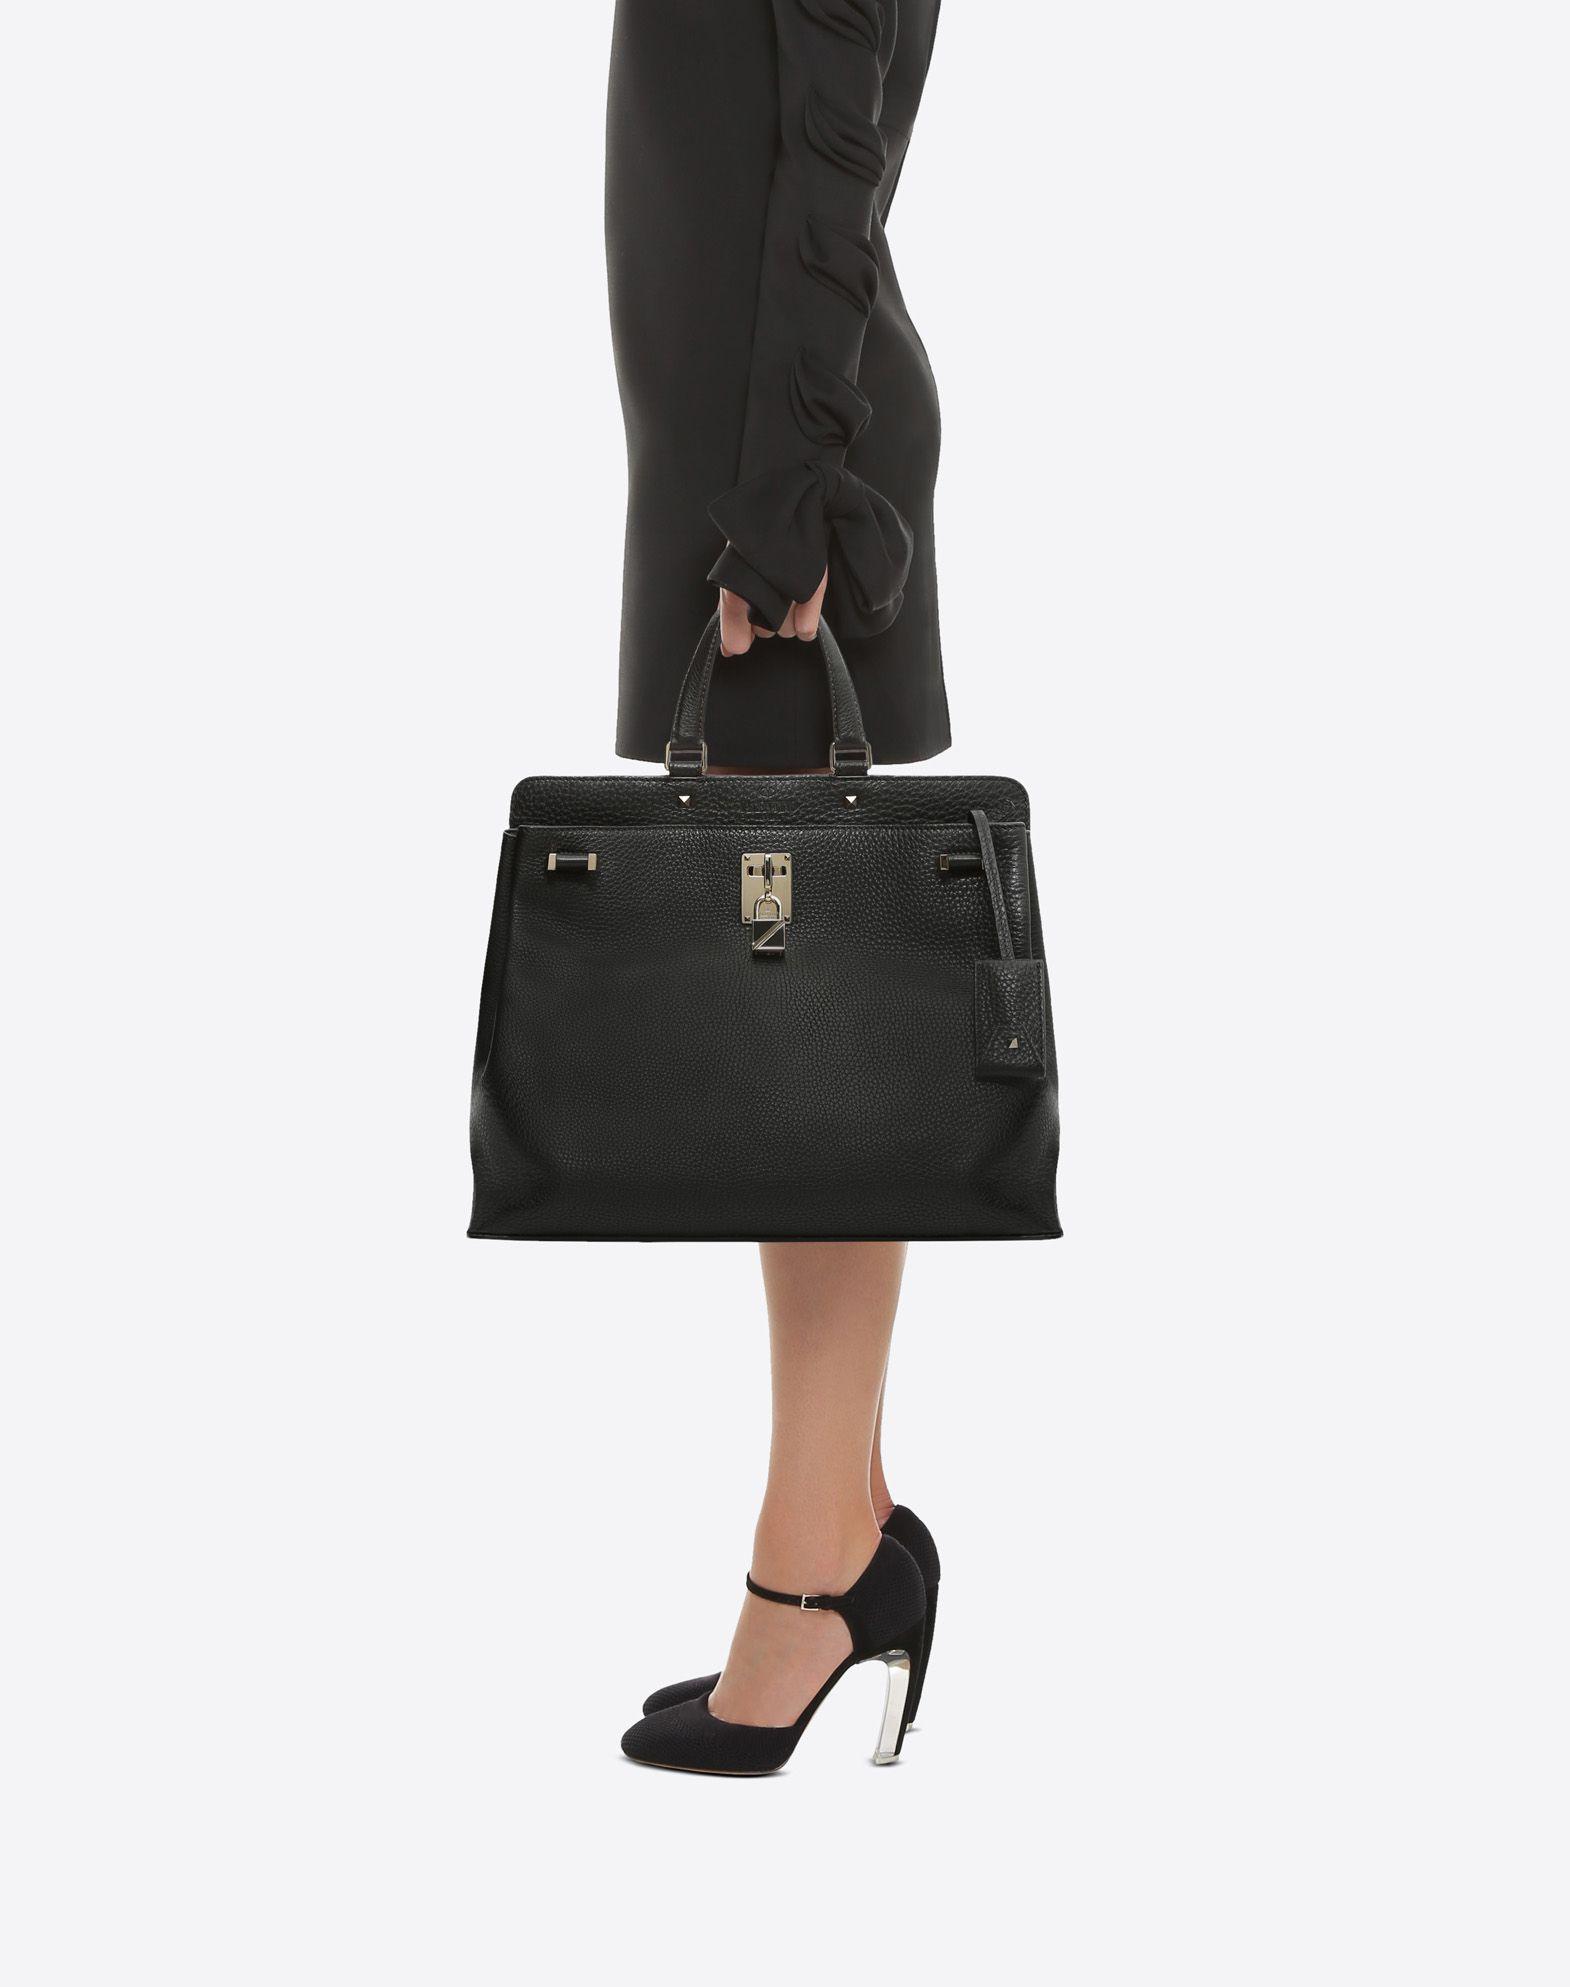 VALENTINO GARAVANI Joylock Handbag HANDBAG D a